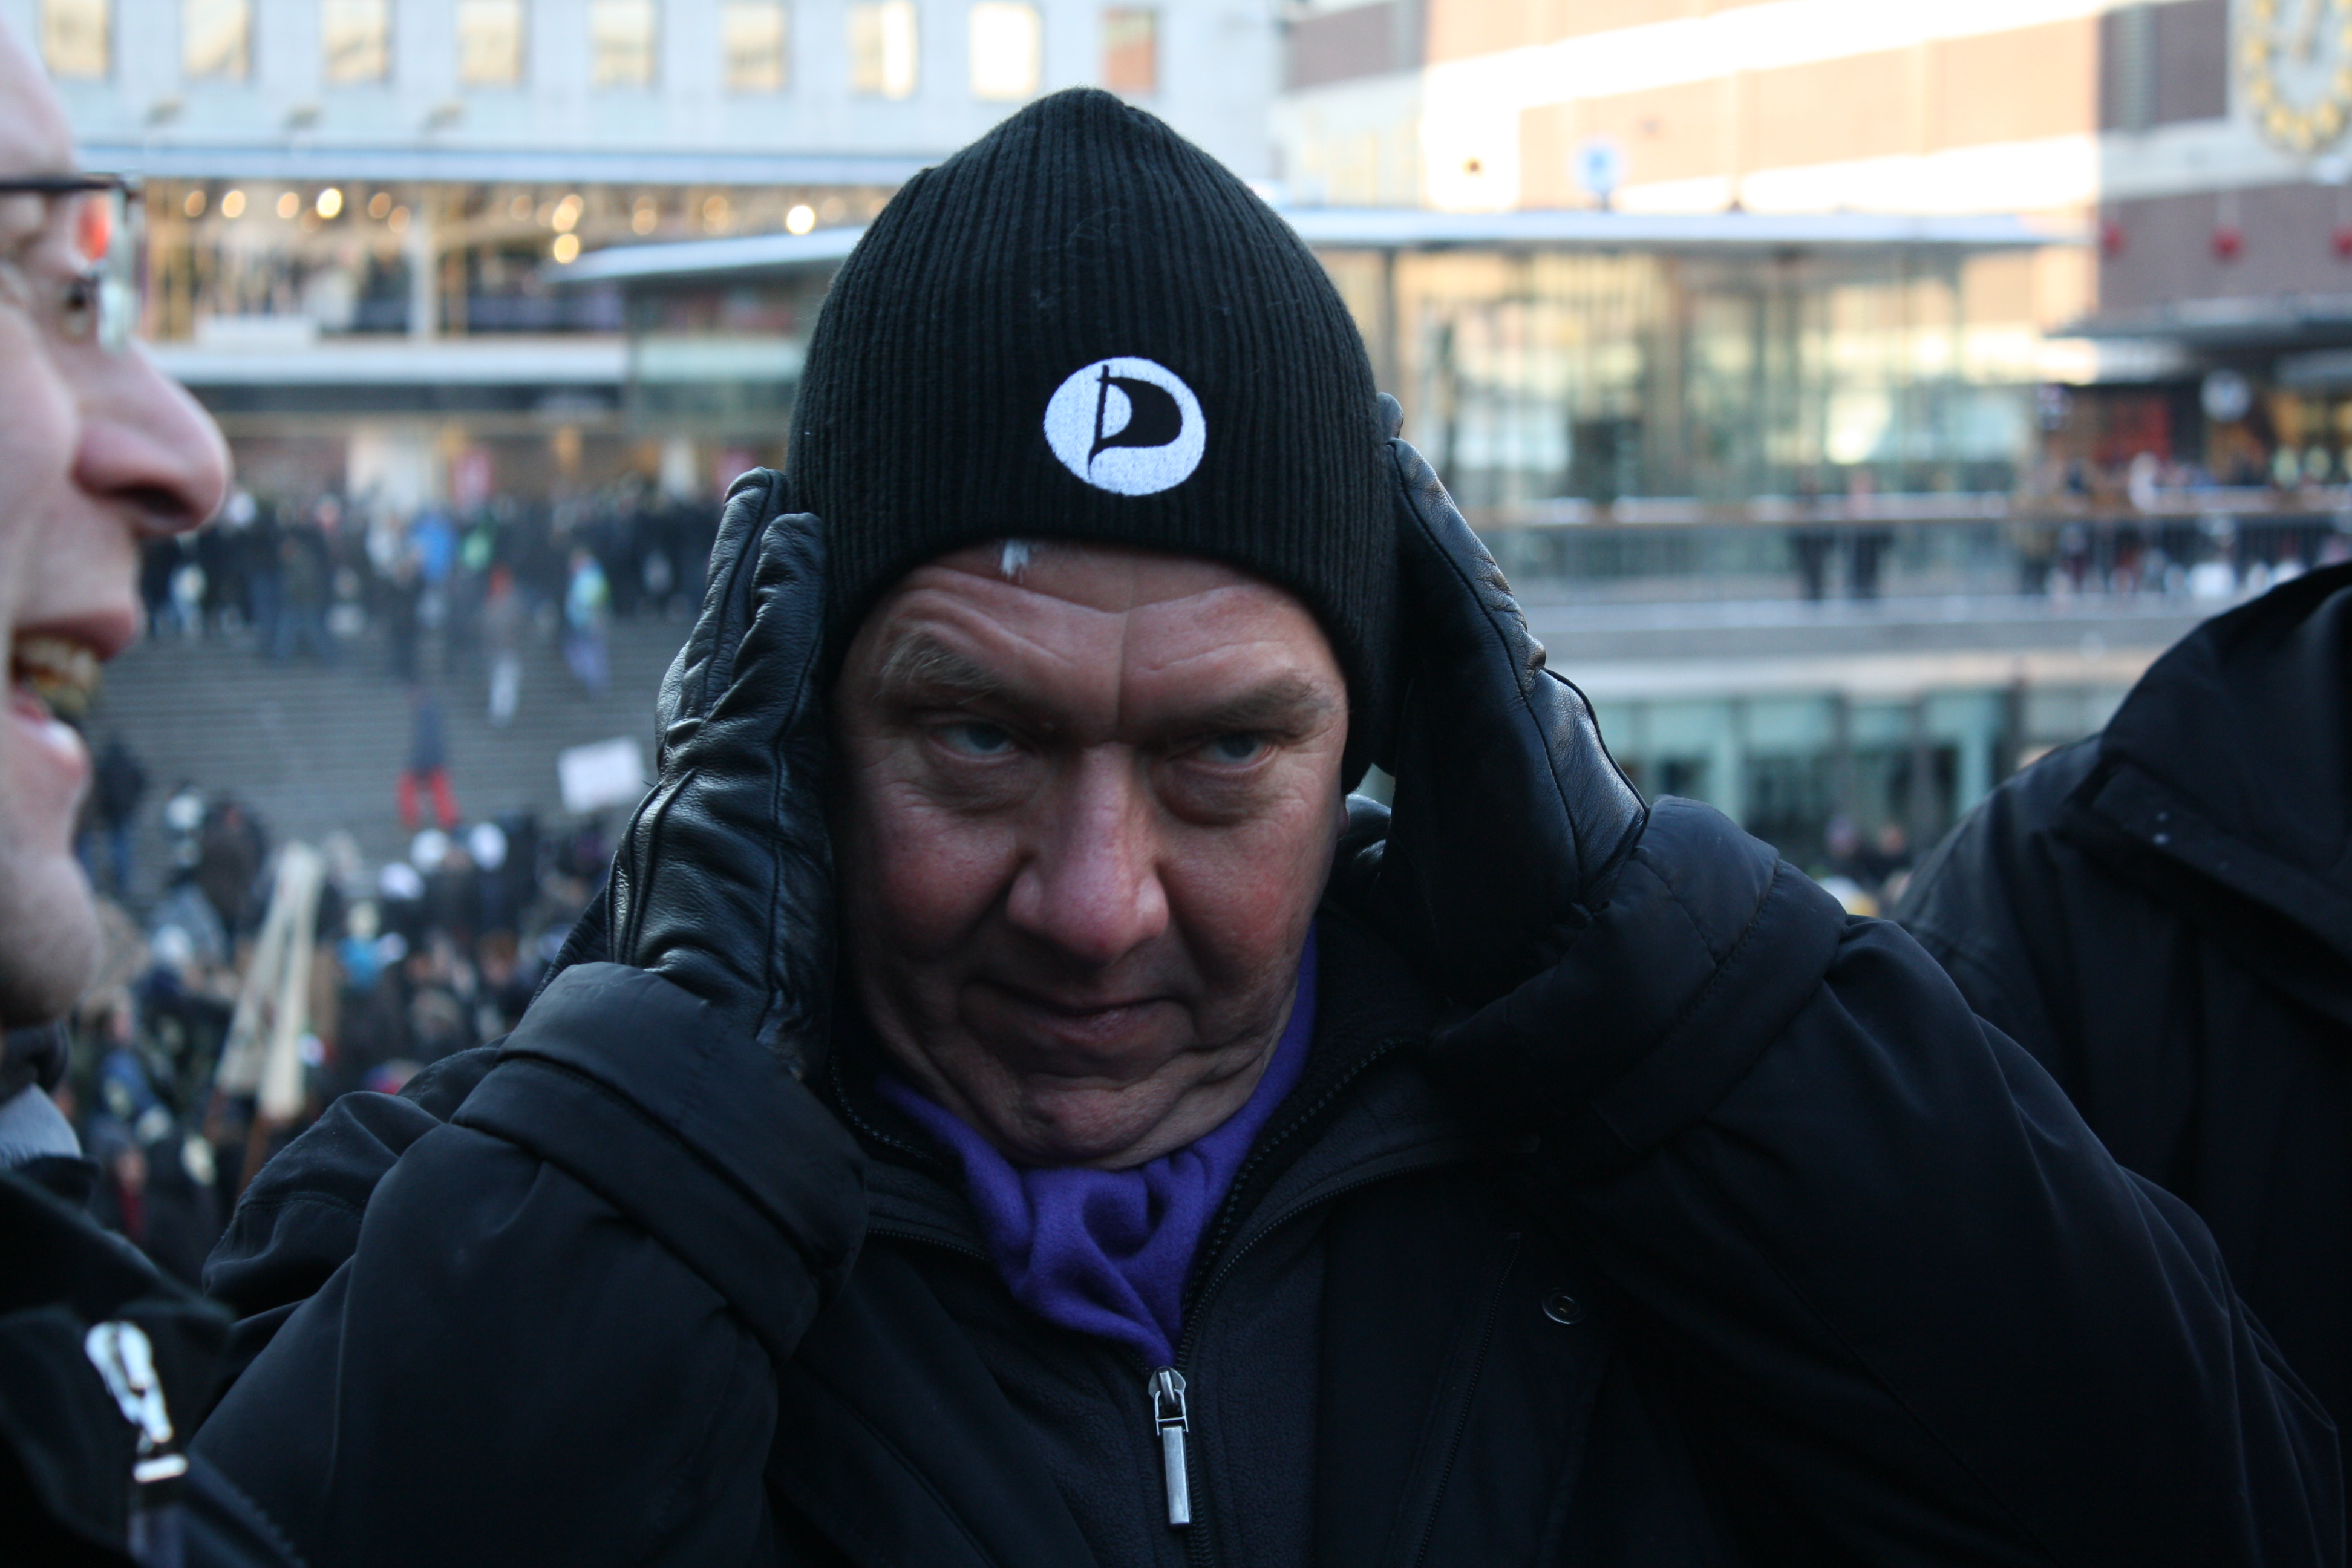 Christian Engström, en av den lilla skaran ACTA-kritiker i EU-parlamentet tillika Piratpartiets första EU-parlamentariker. Foto: Axel Pettersson, CC-BY-SA 3.0